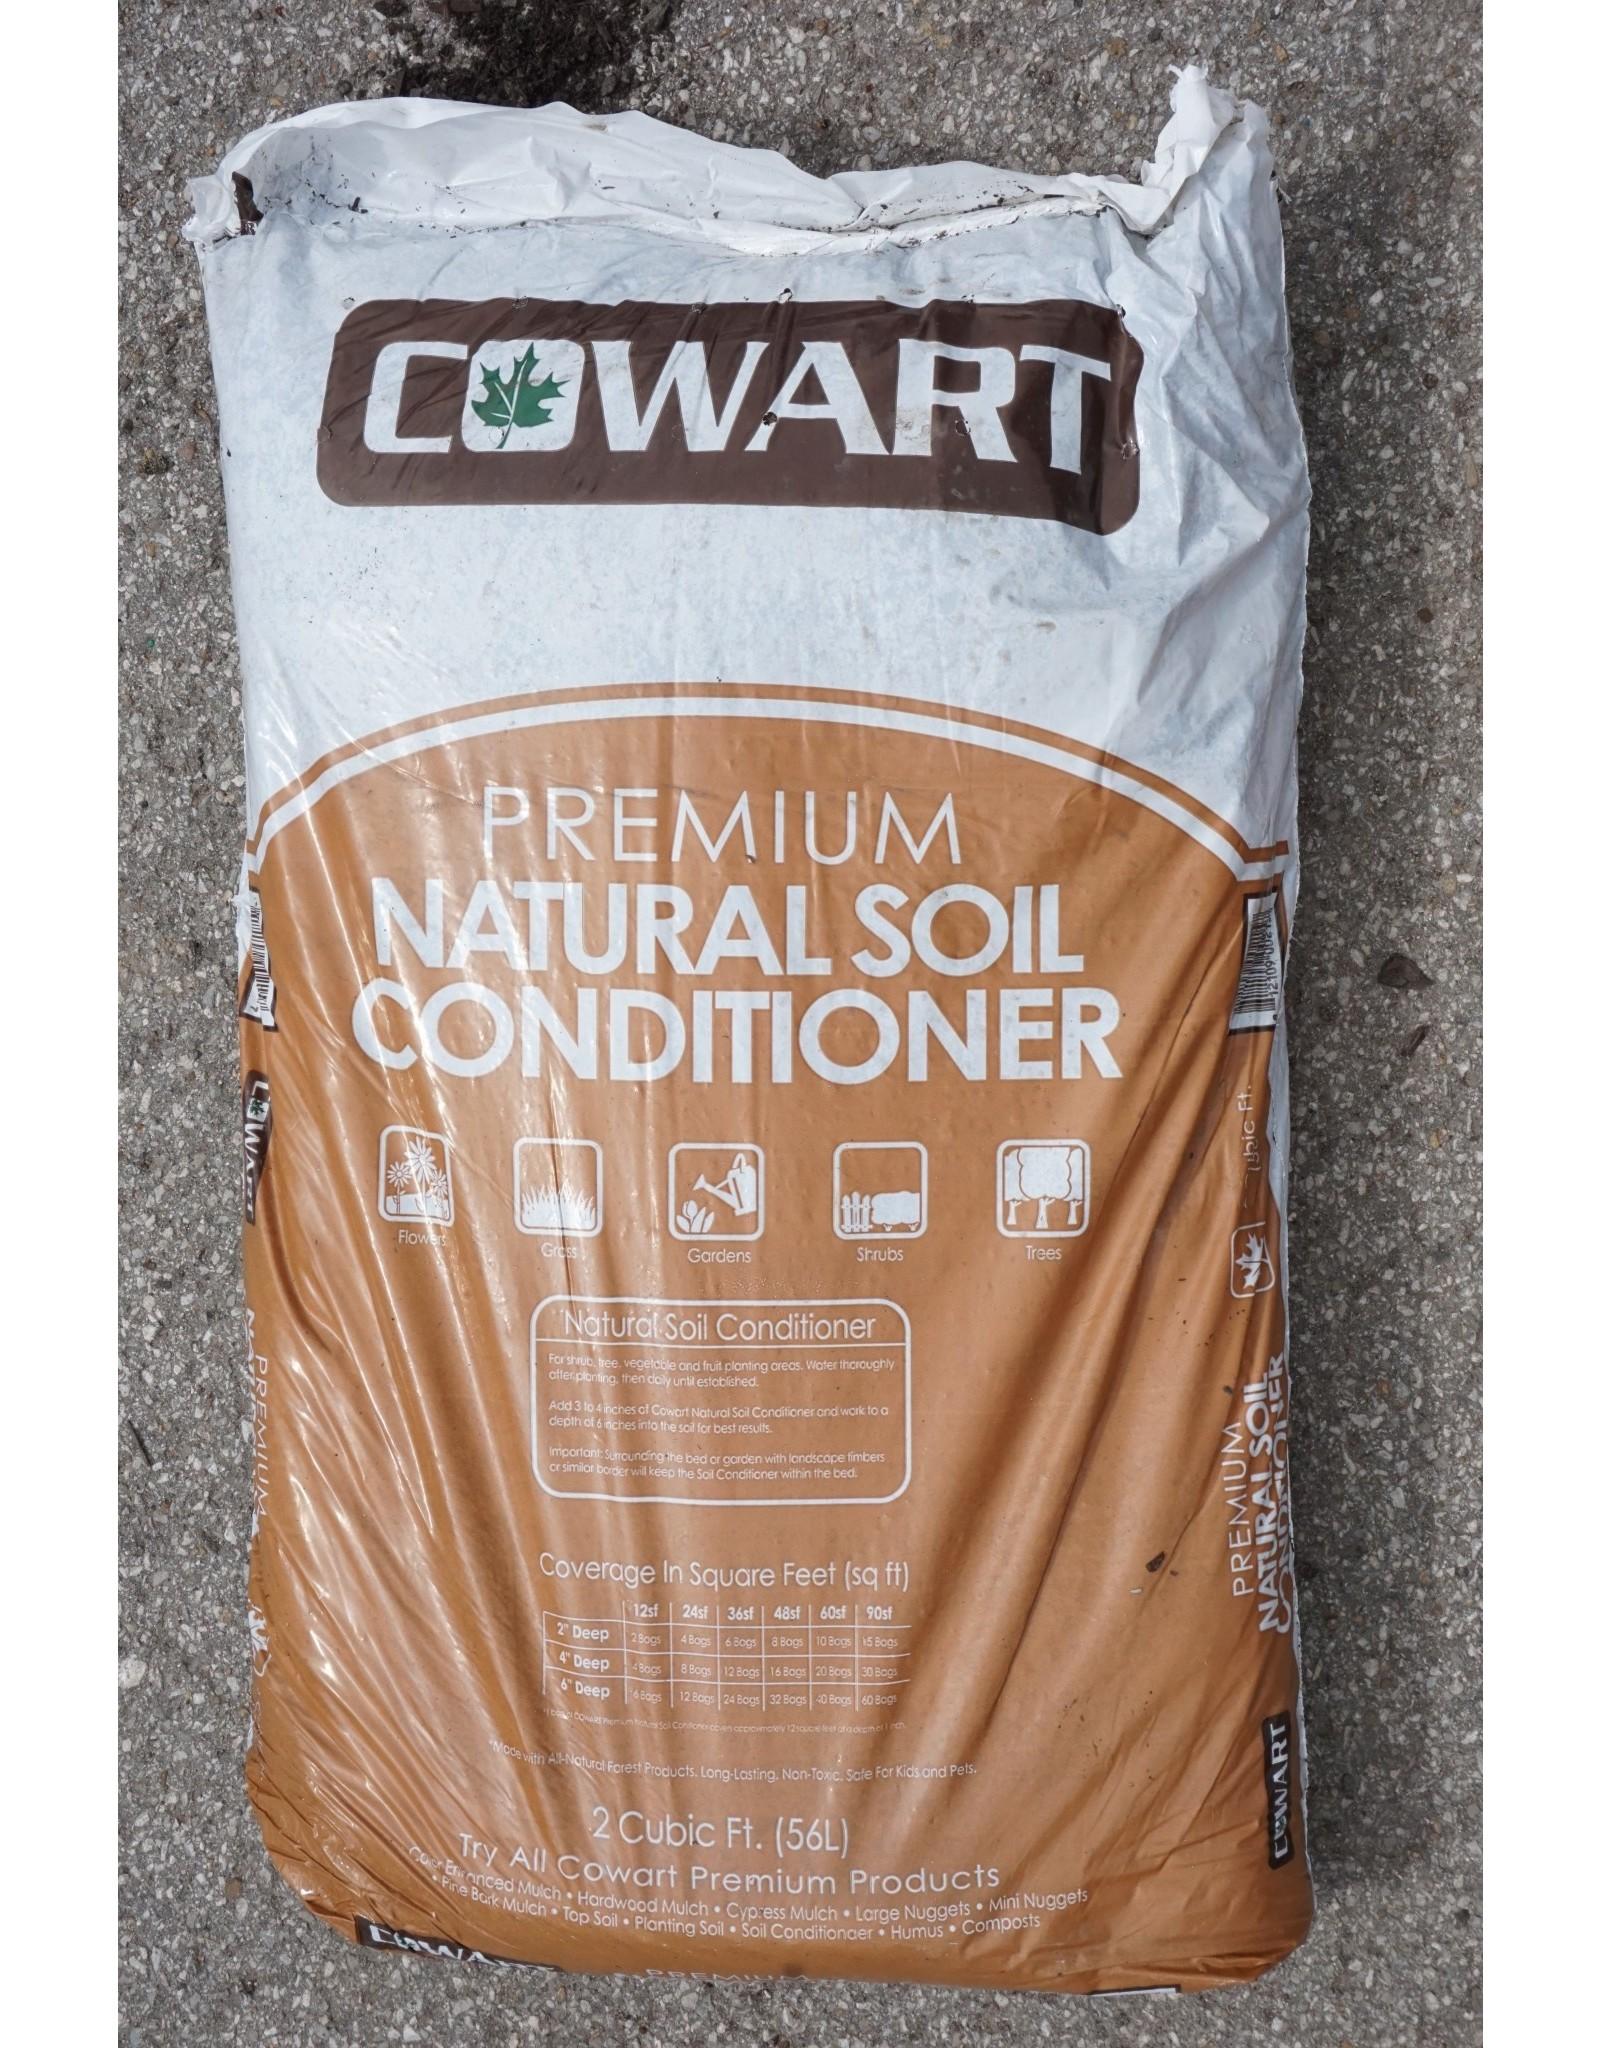 Soil Conditioner - Cowart - 2 cu. ft.